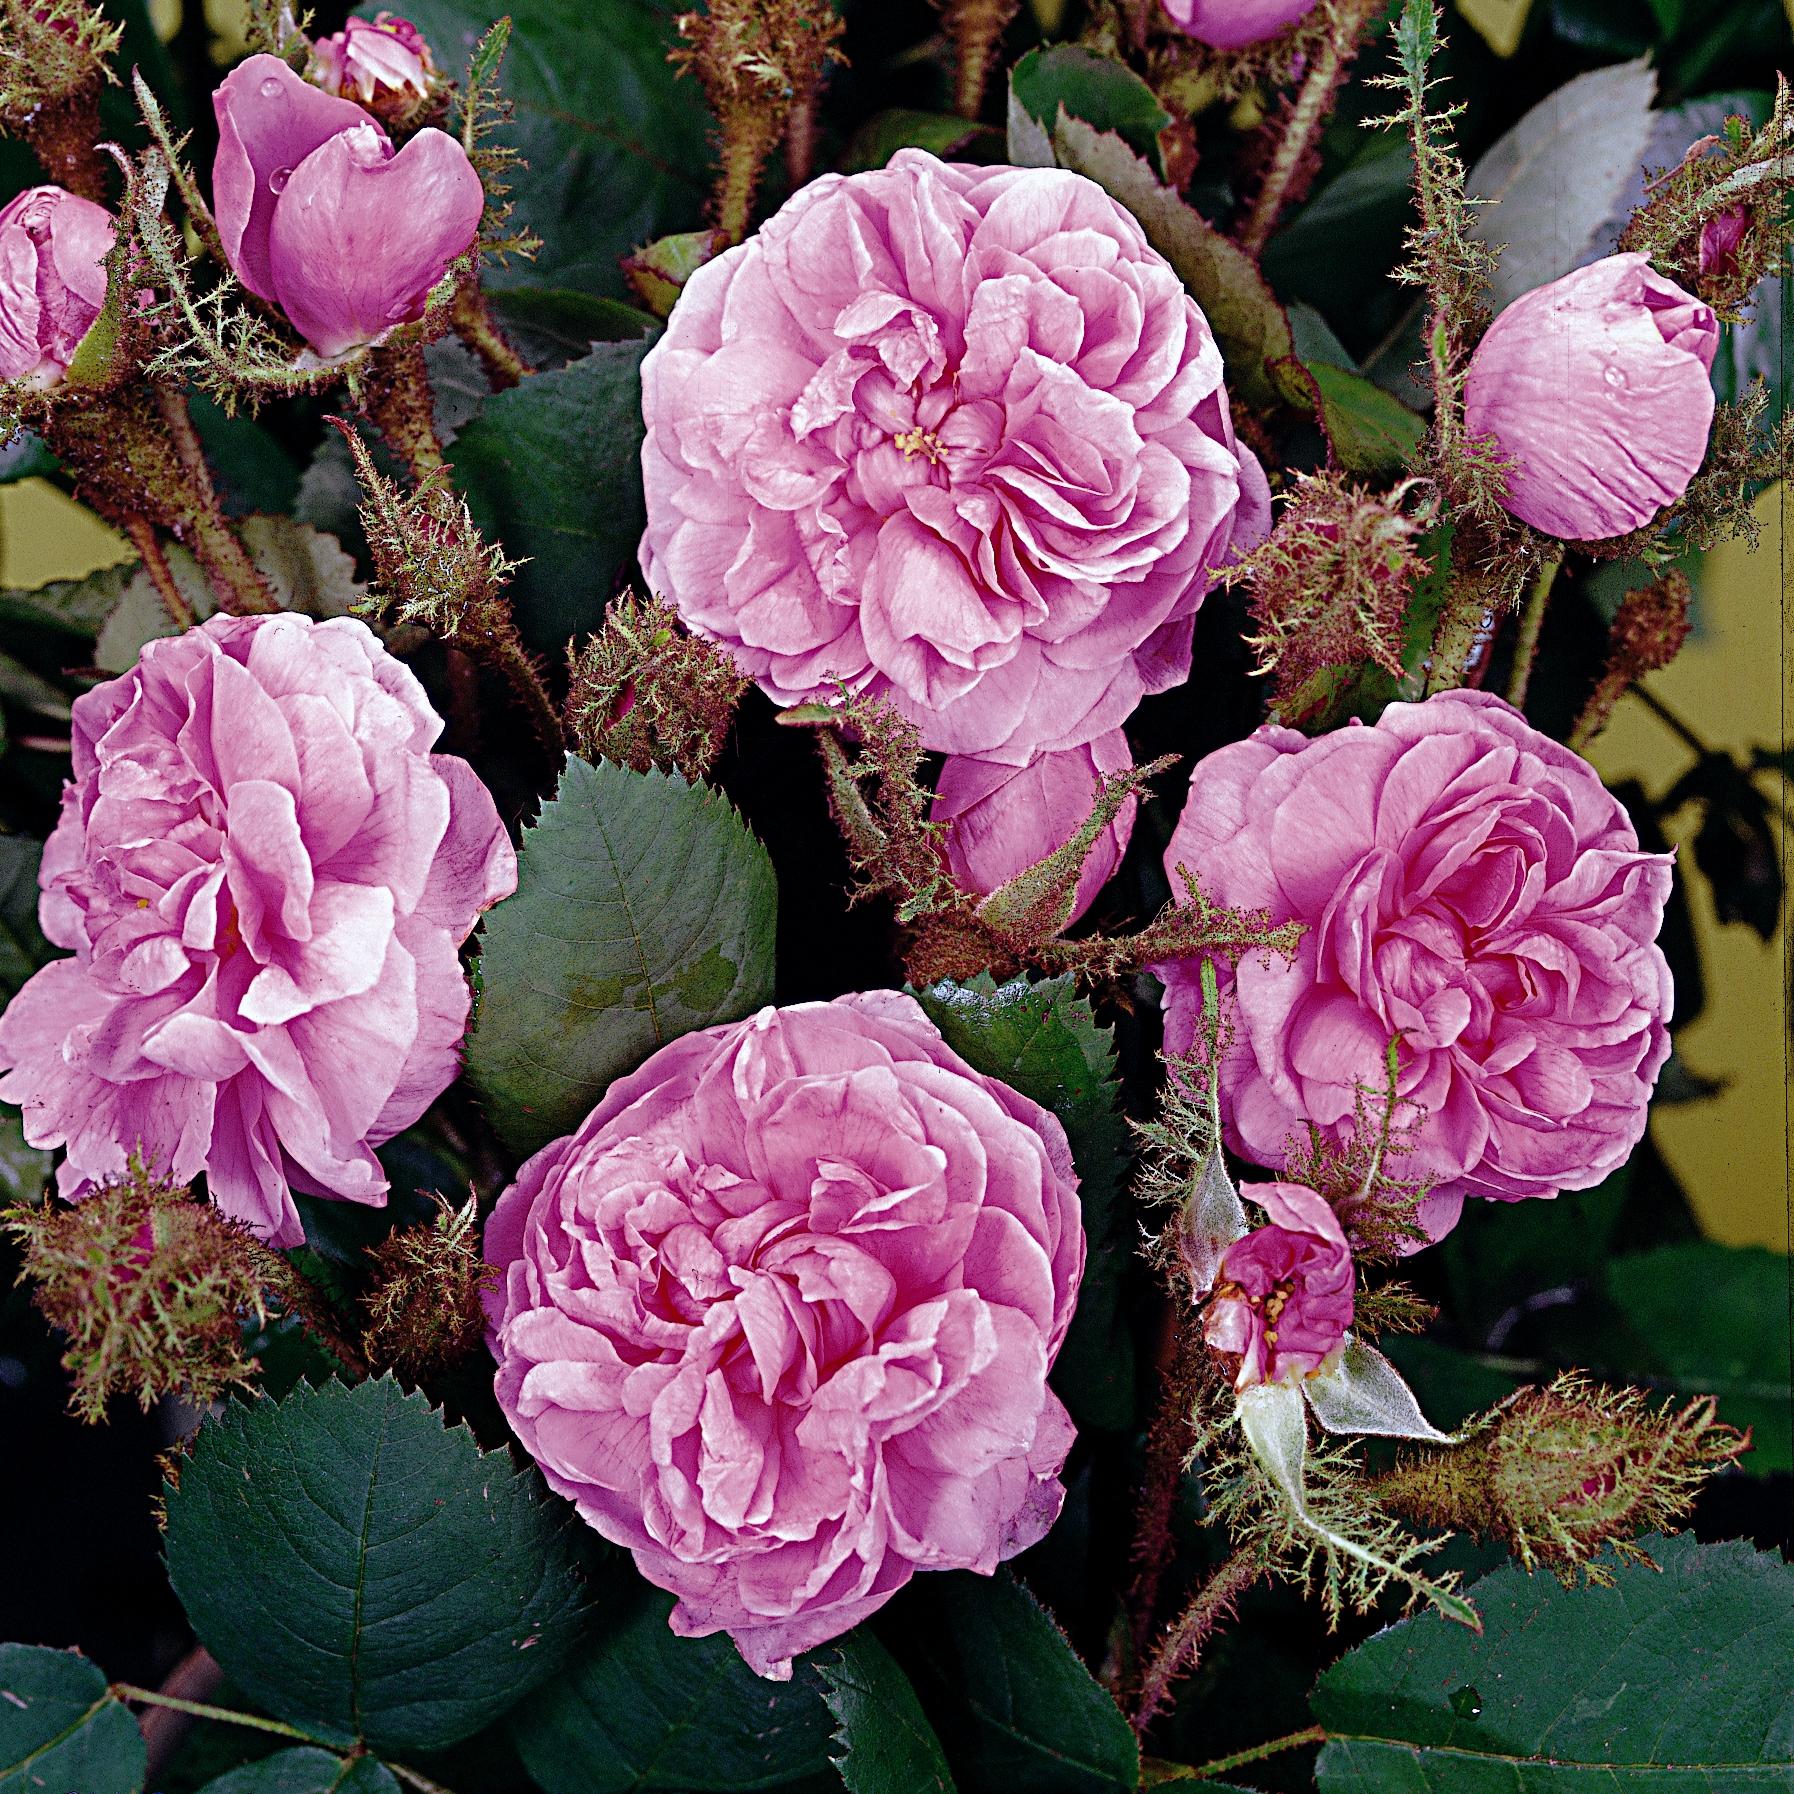 rosa centifolia muscosa park und wildrosen online. Black Bedroom Furniture Sets. Home Design Ideas